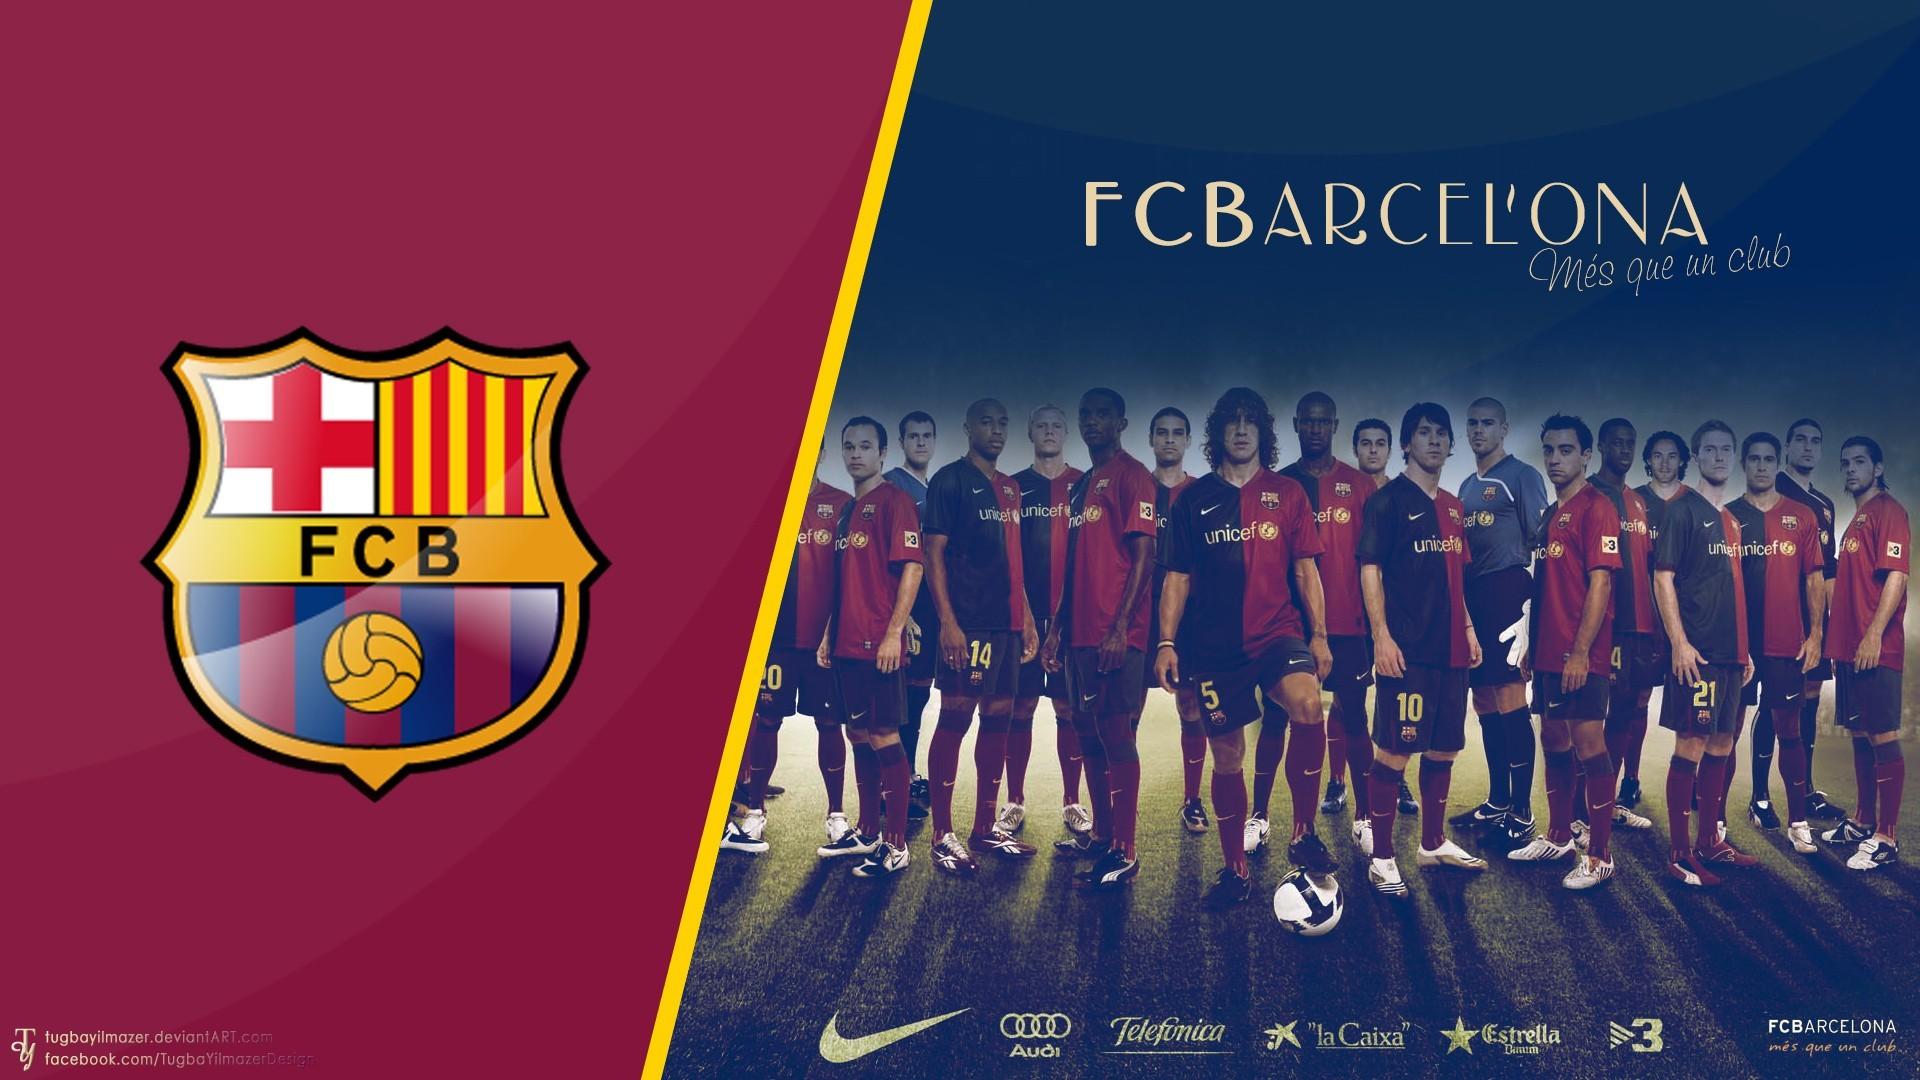 … barcelona wallpapers on kubipet com …